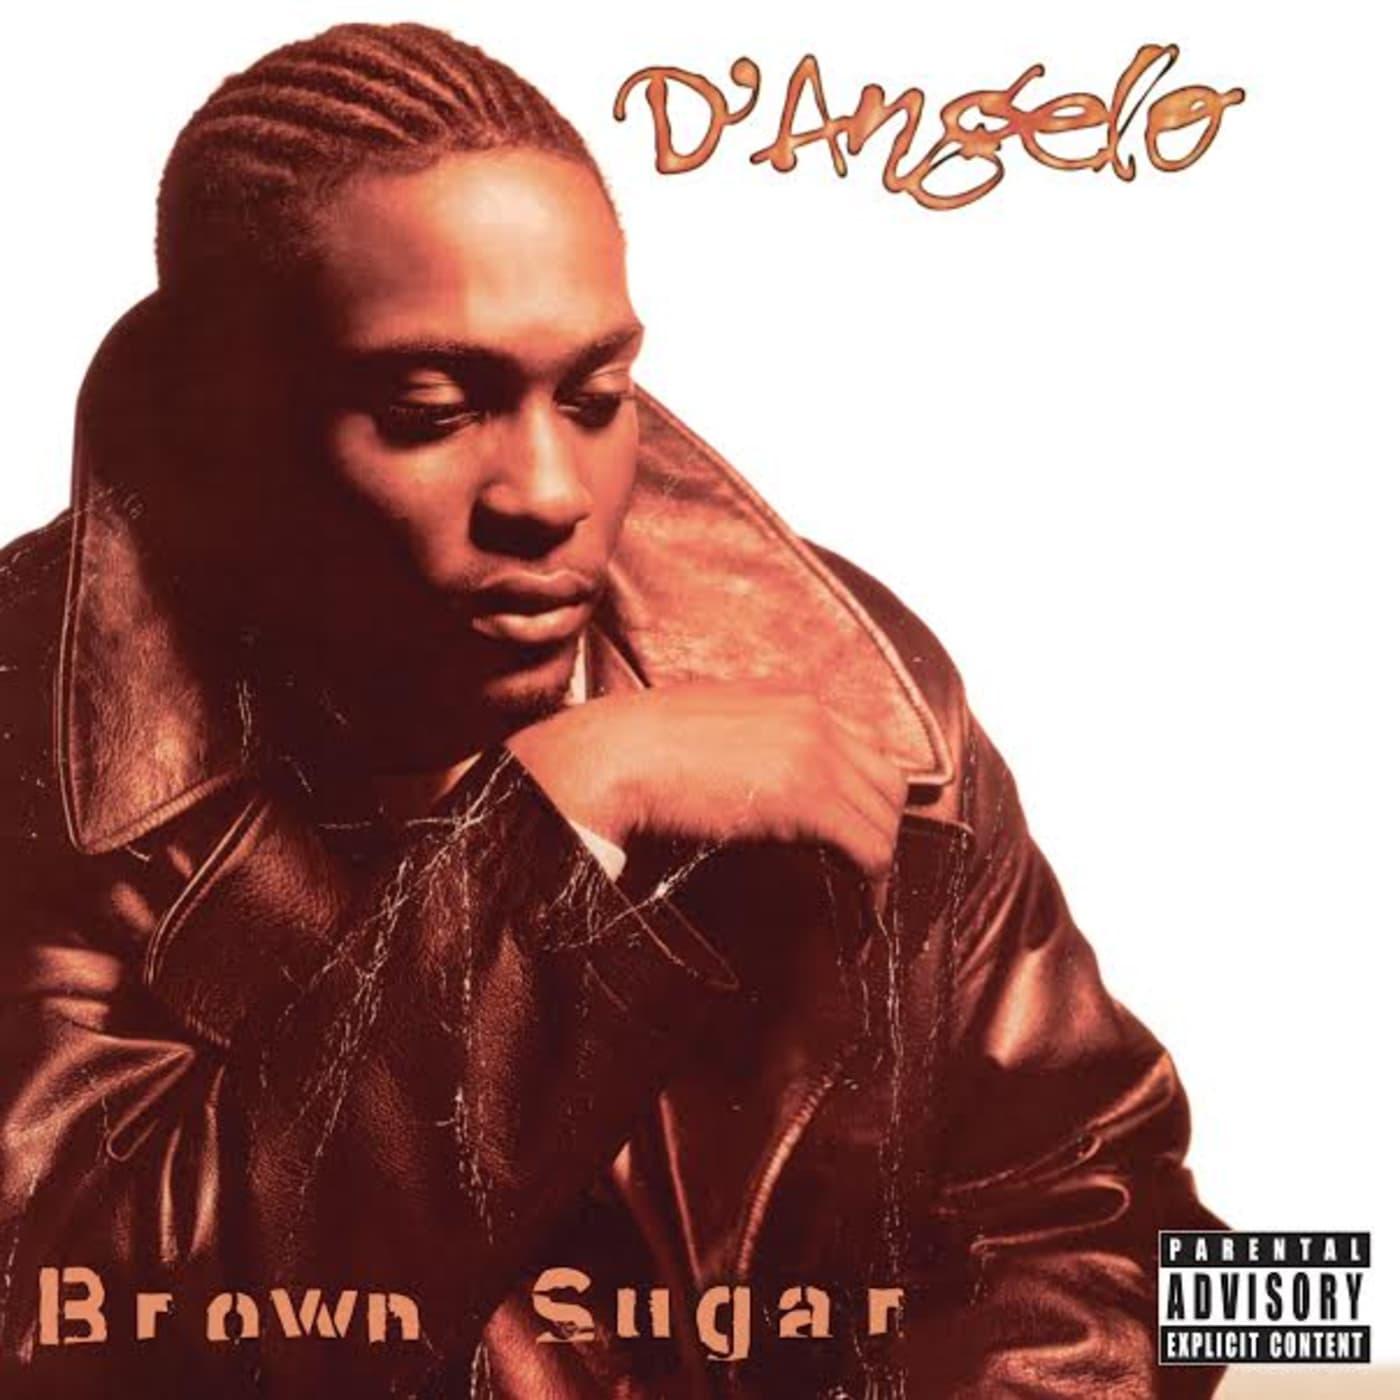 dangelo brown sugar artwork